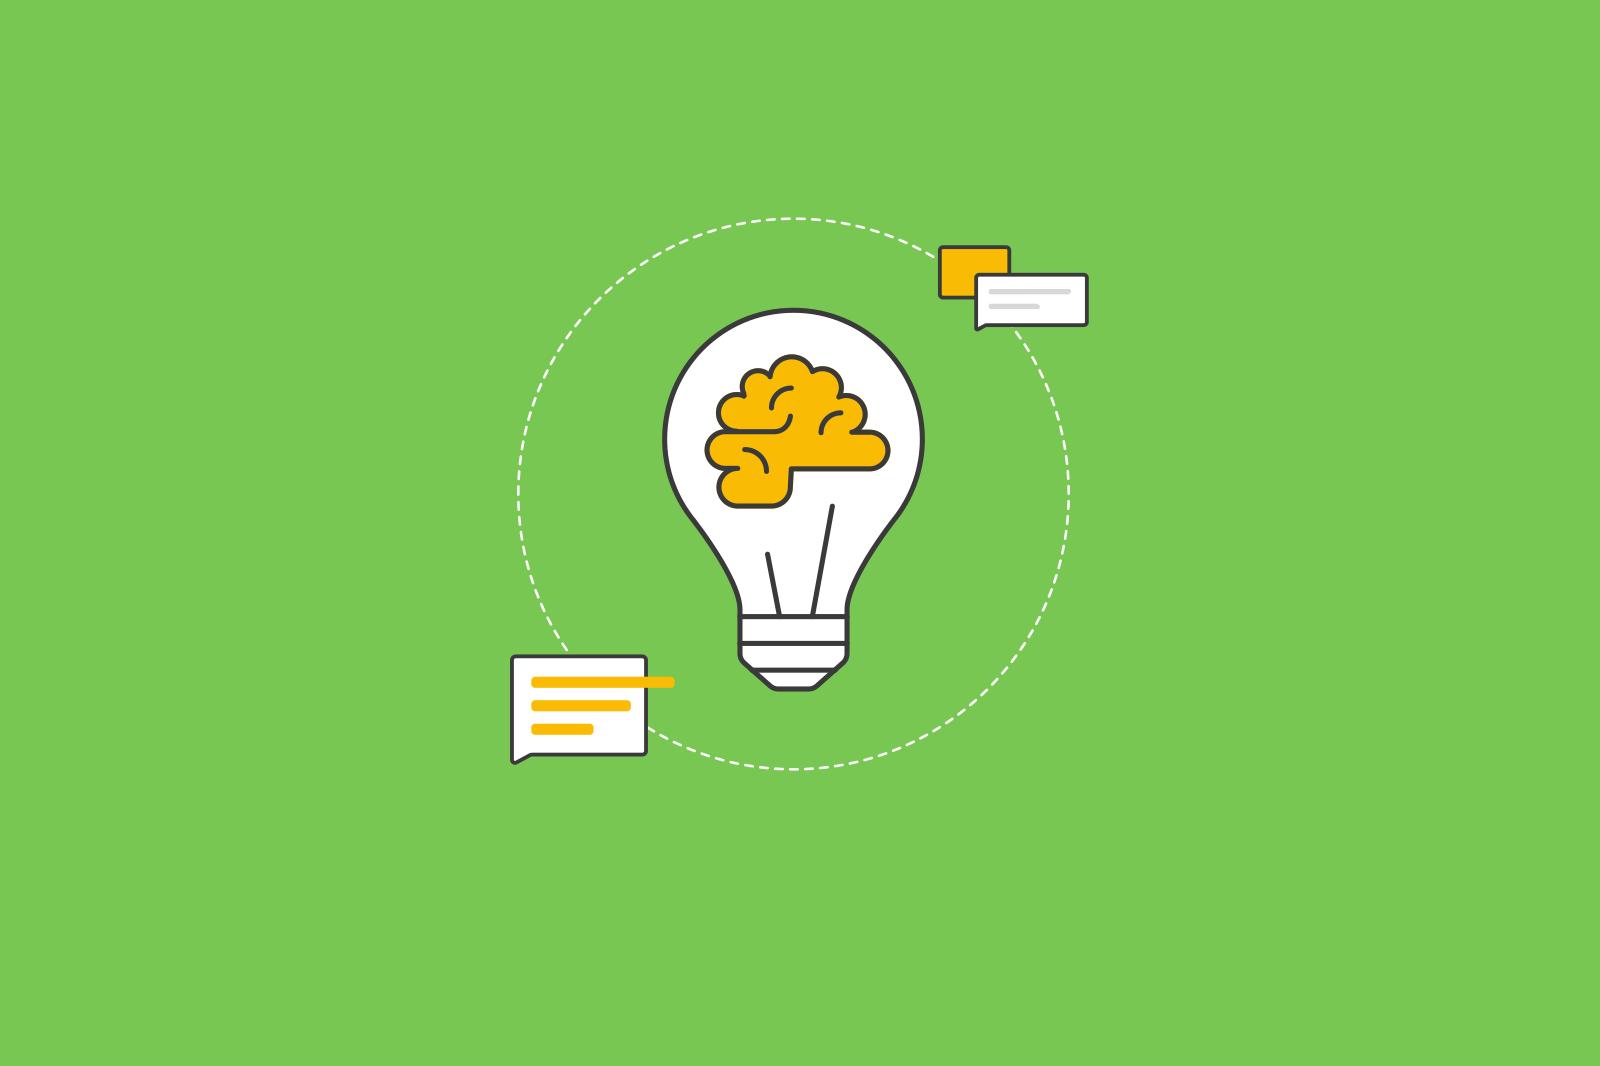 Slido ideas brainstorming tool